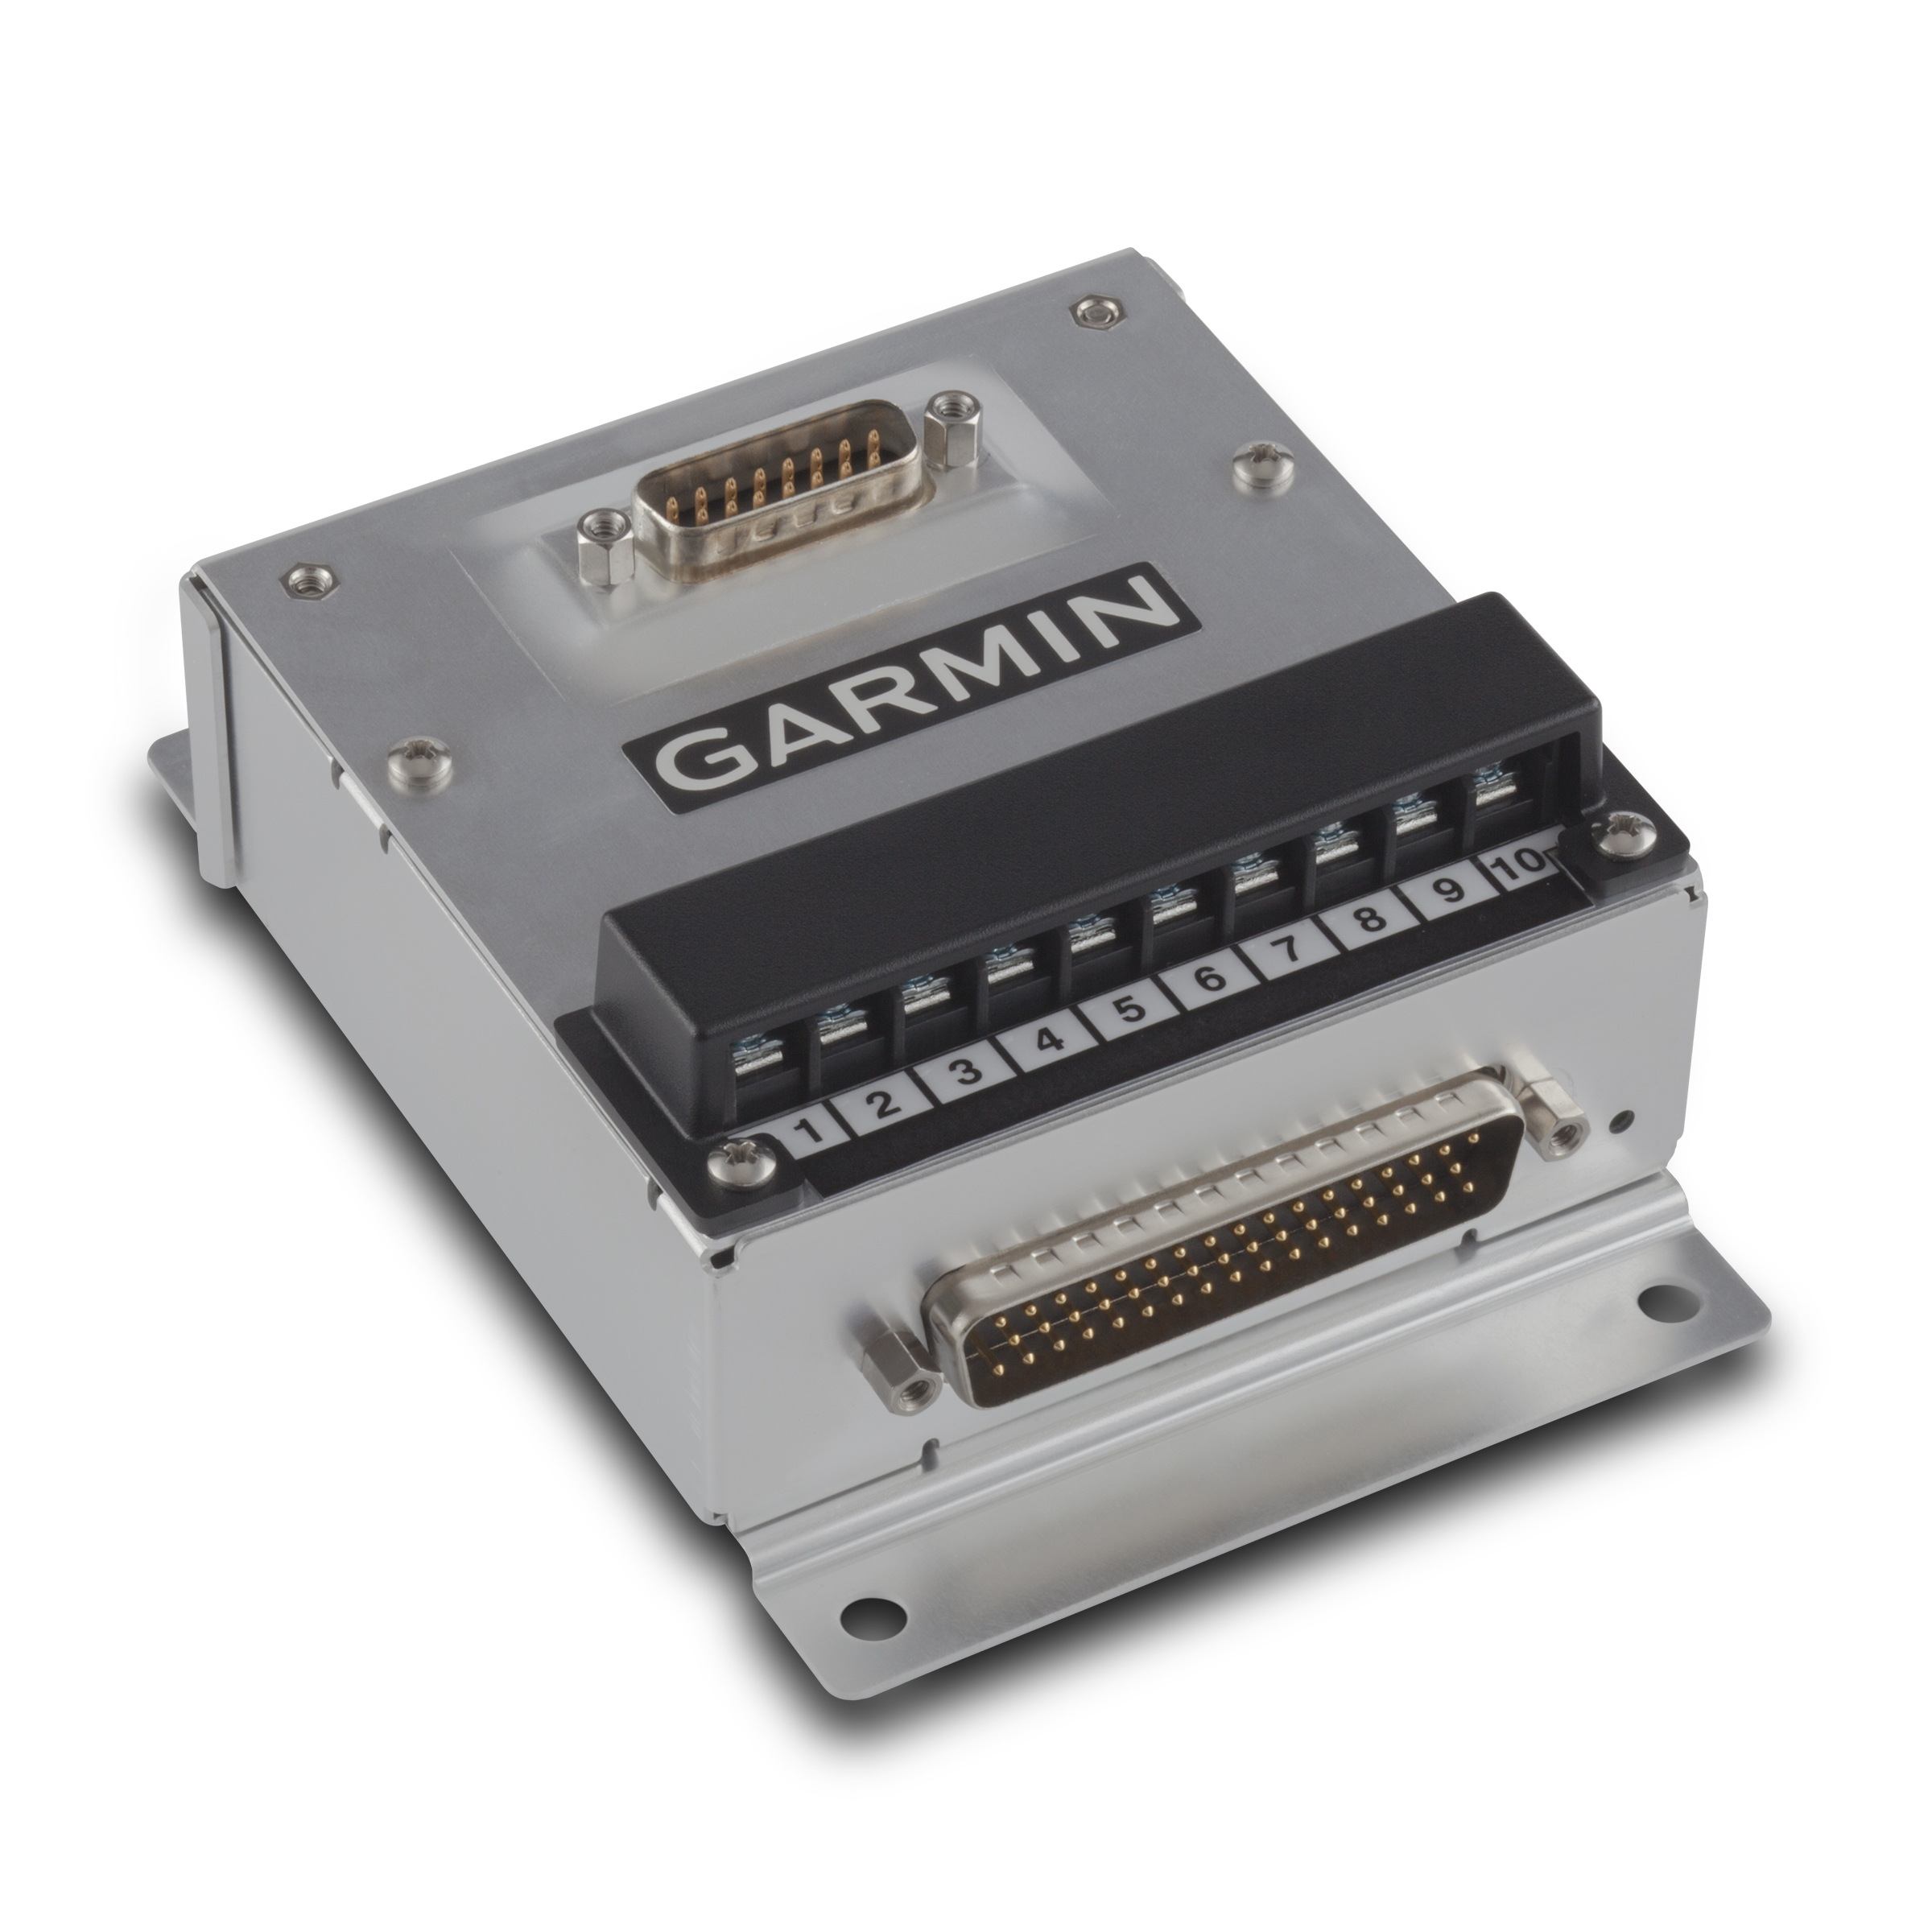 Garmin® Team X Introduces Single Solution For Expanded